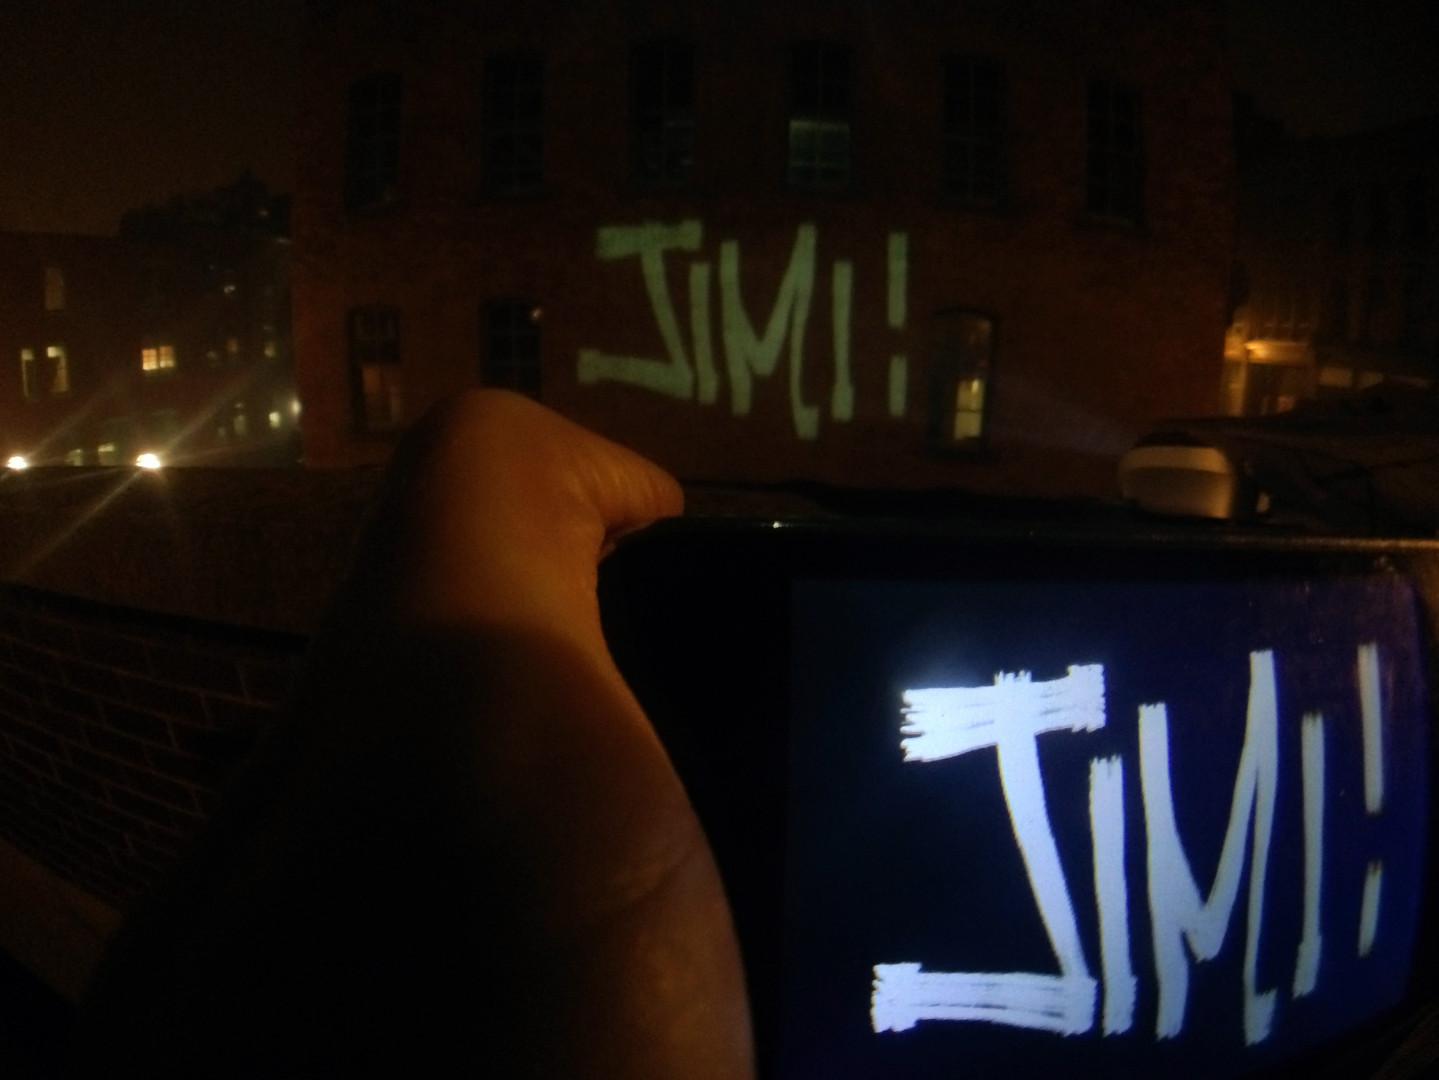 Third Shift 2015 - Phone to Wall